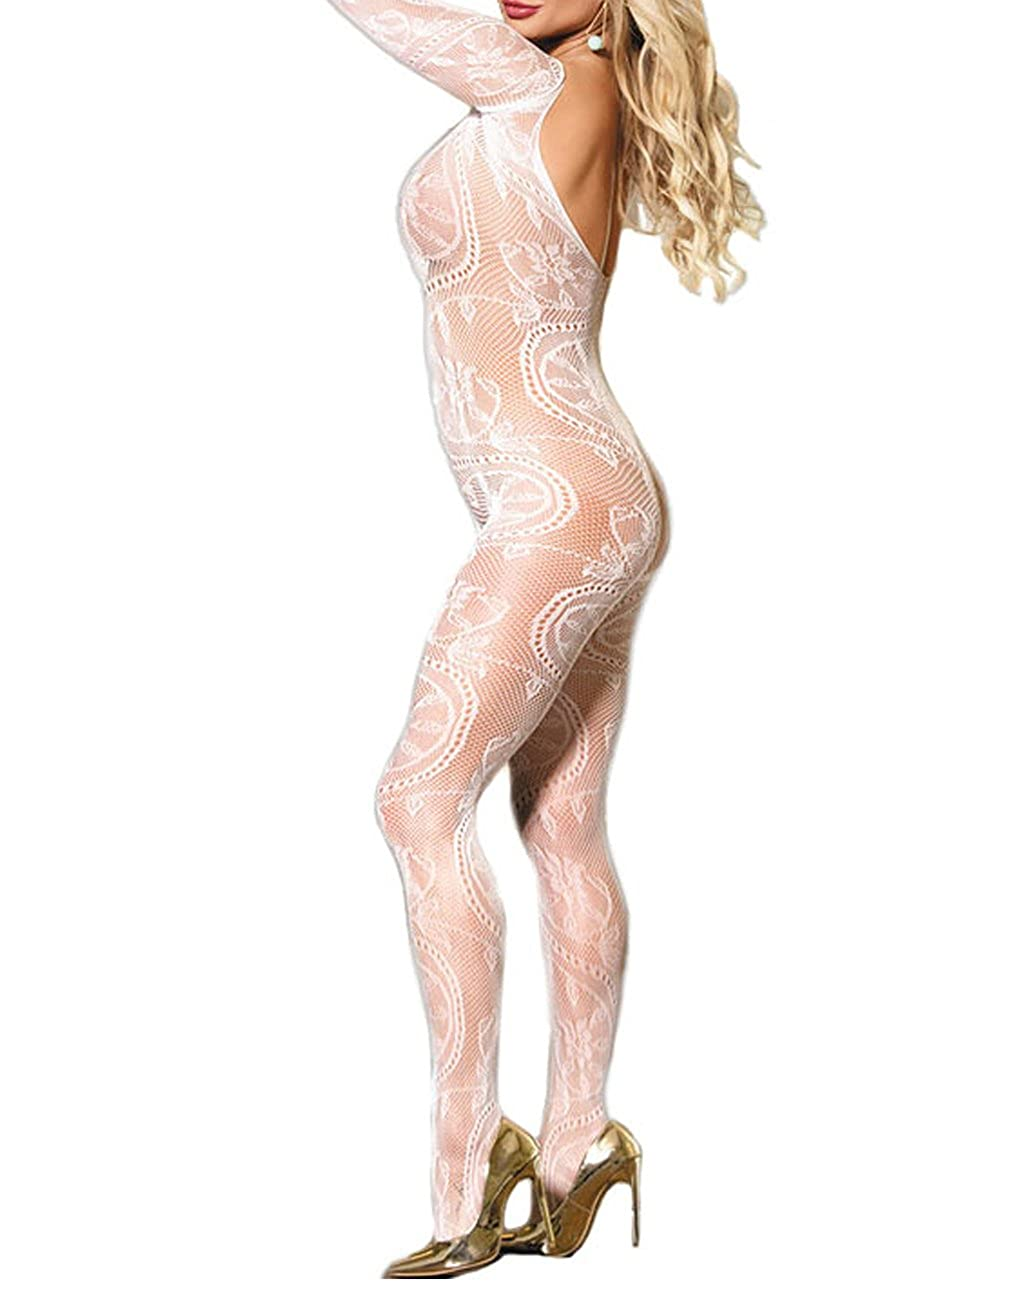 8c96ef4d3ee Amazon.com  Lookswe Fishnet Bodystockings Women Sexy Half Sleeve Mesh Lingerie  Clubwear Fit S-XXL  Clothing